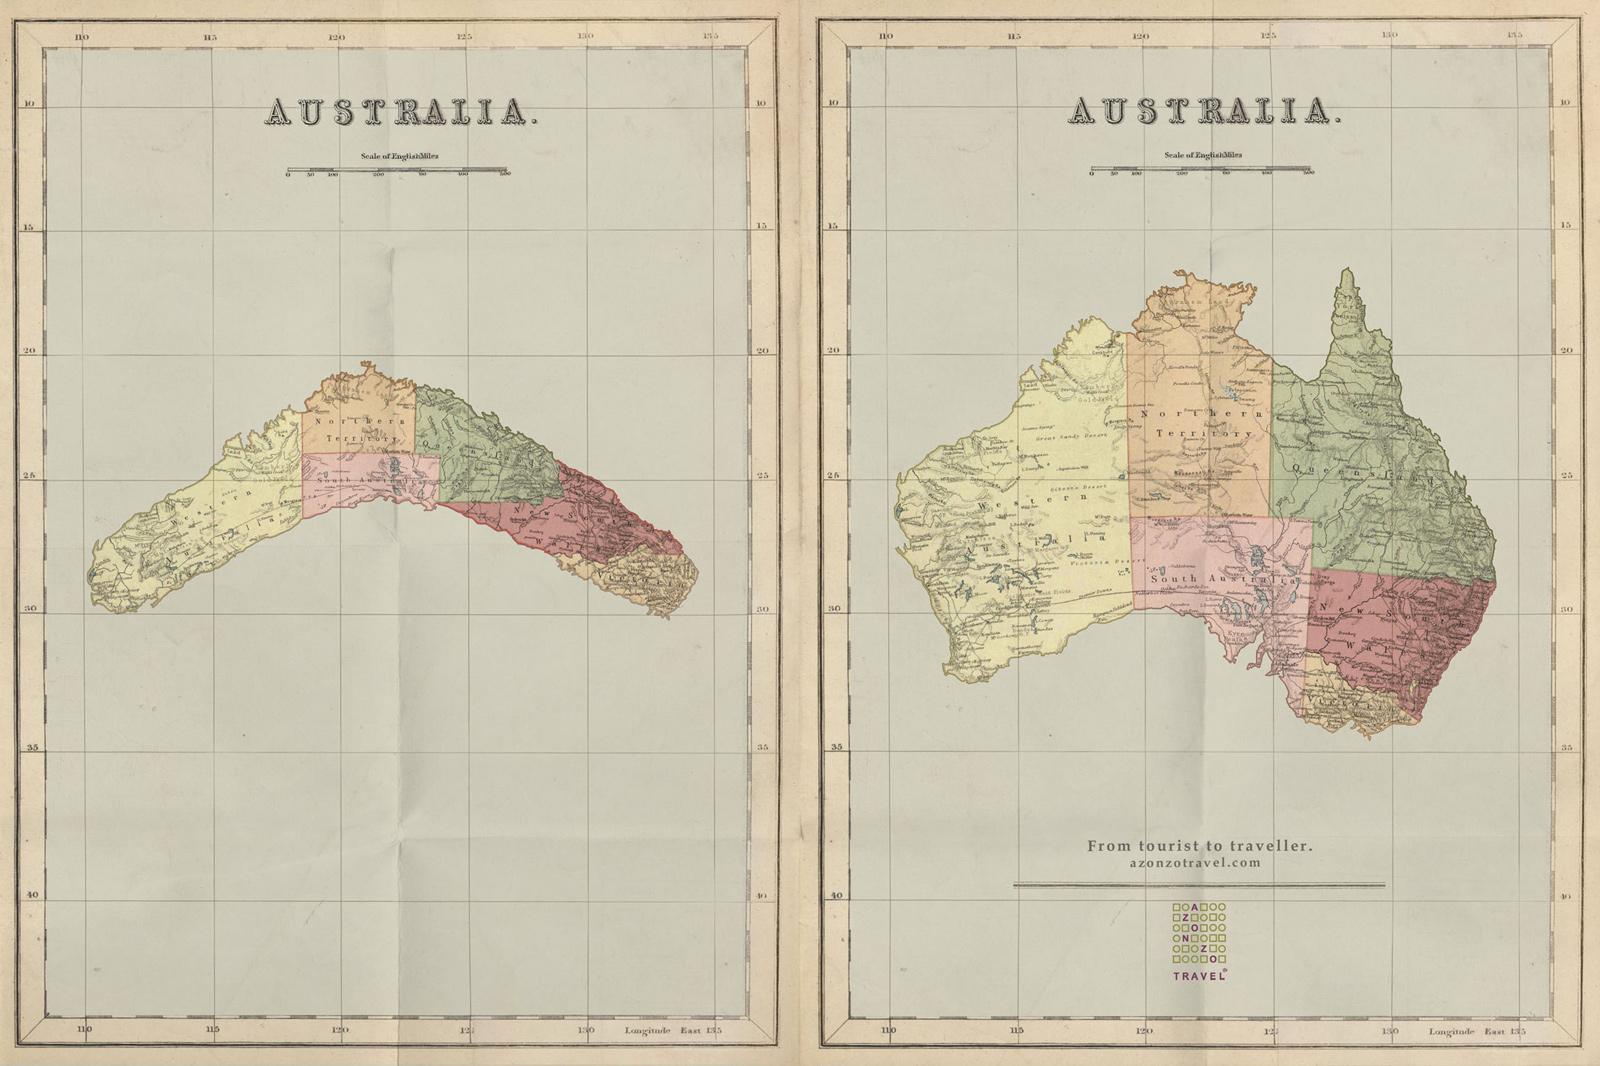 azonzotravel print ad australia map